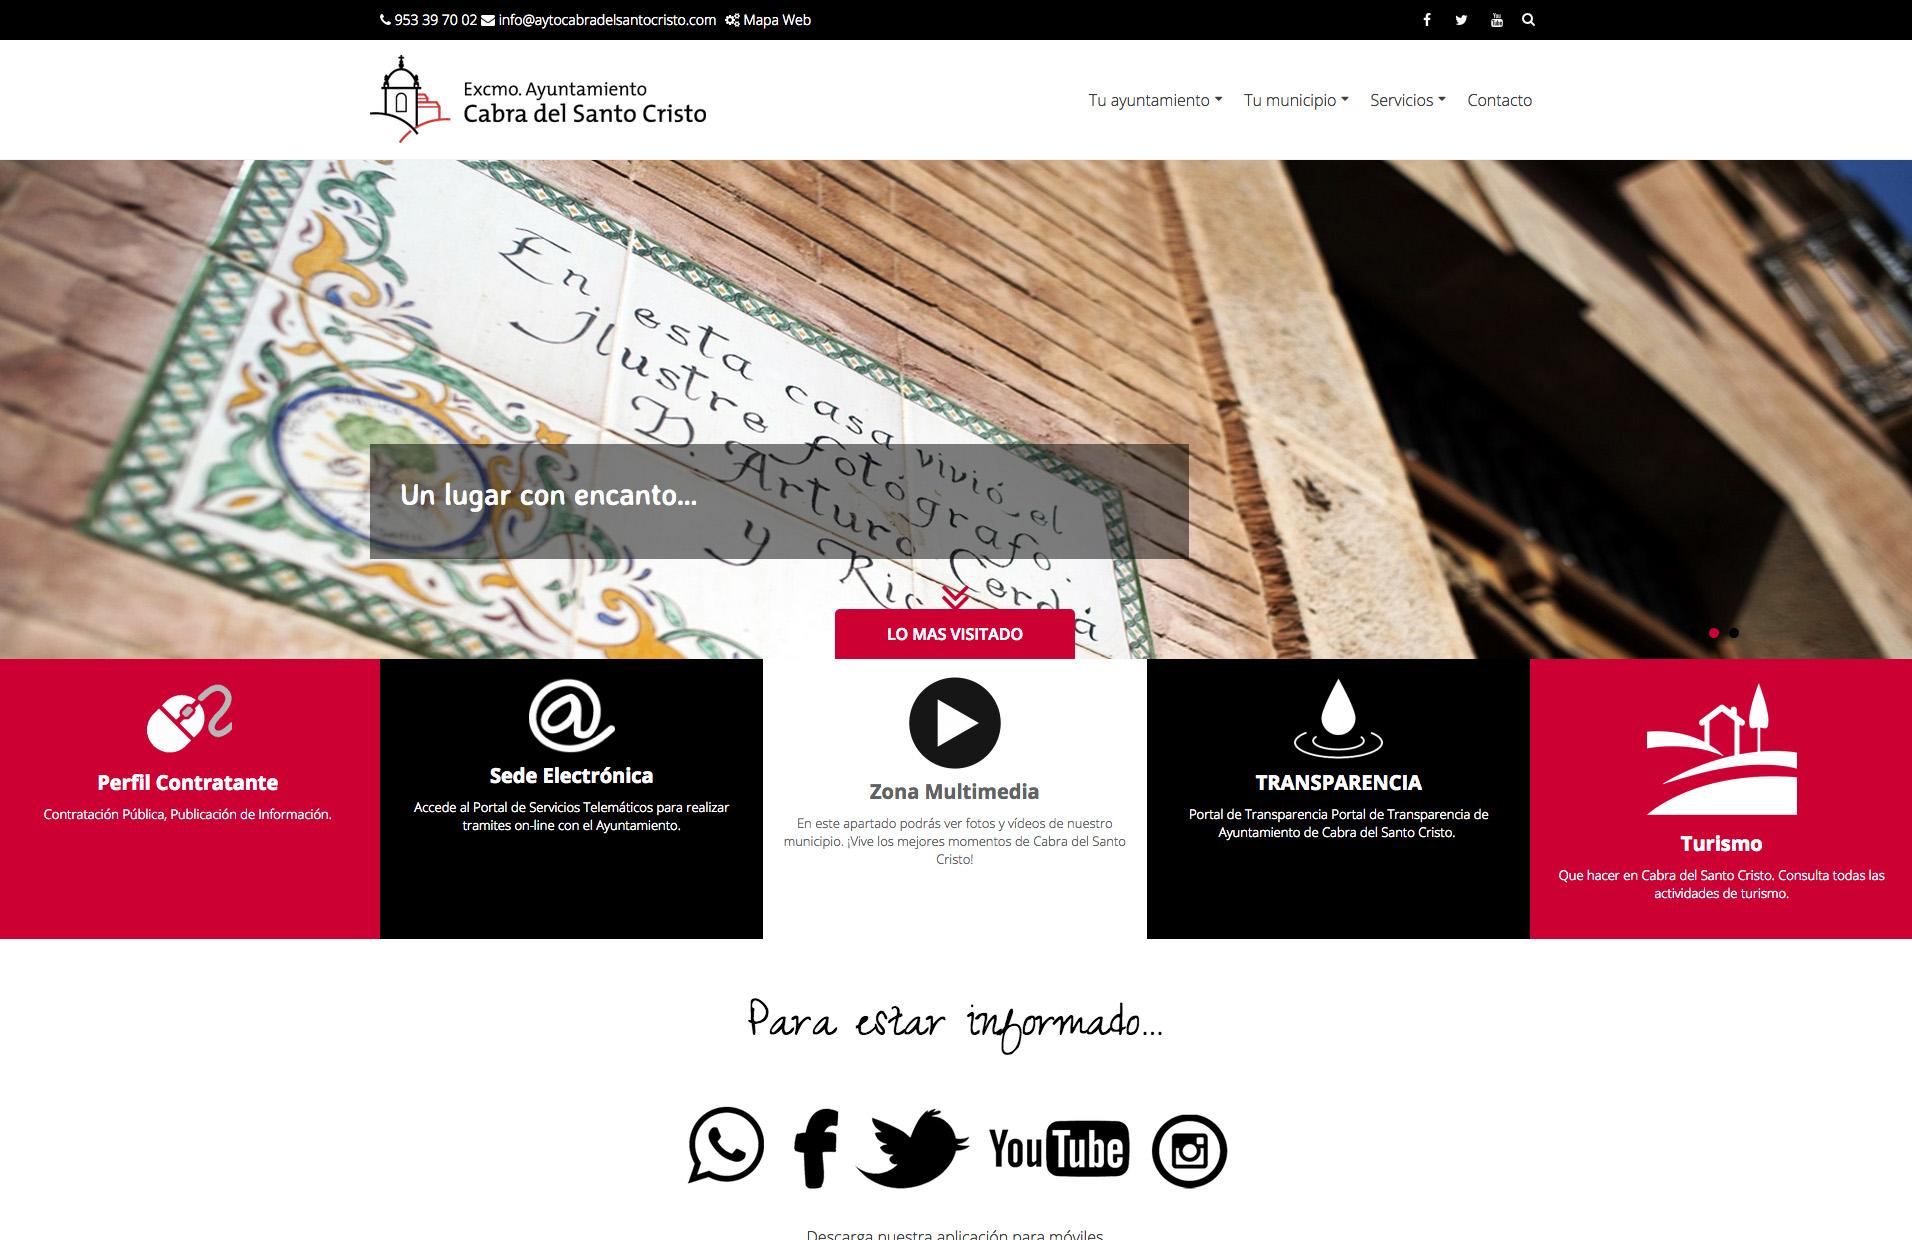 Nueva web municipal